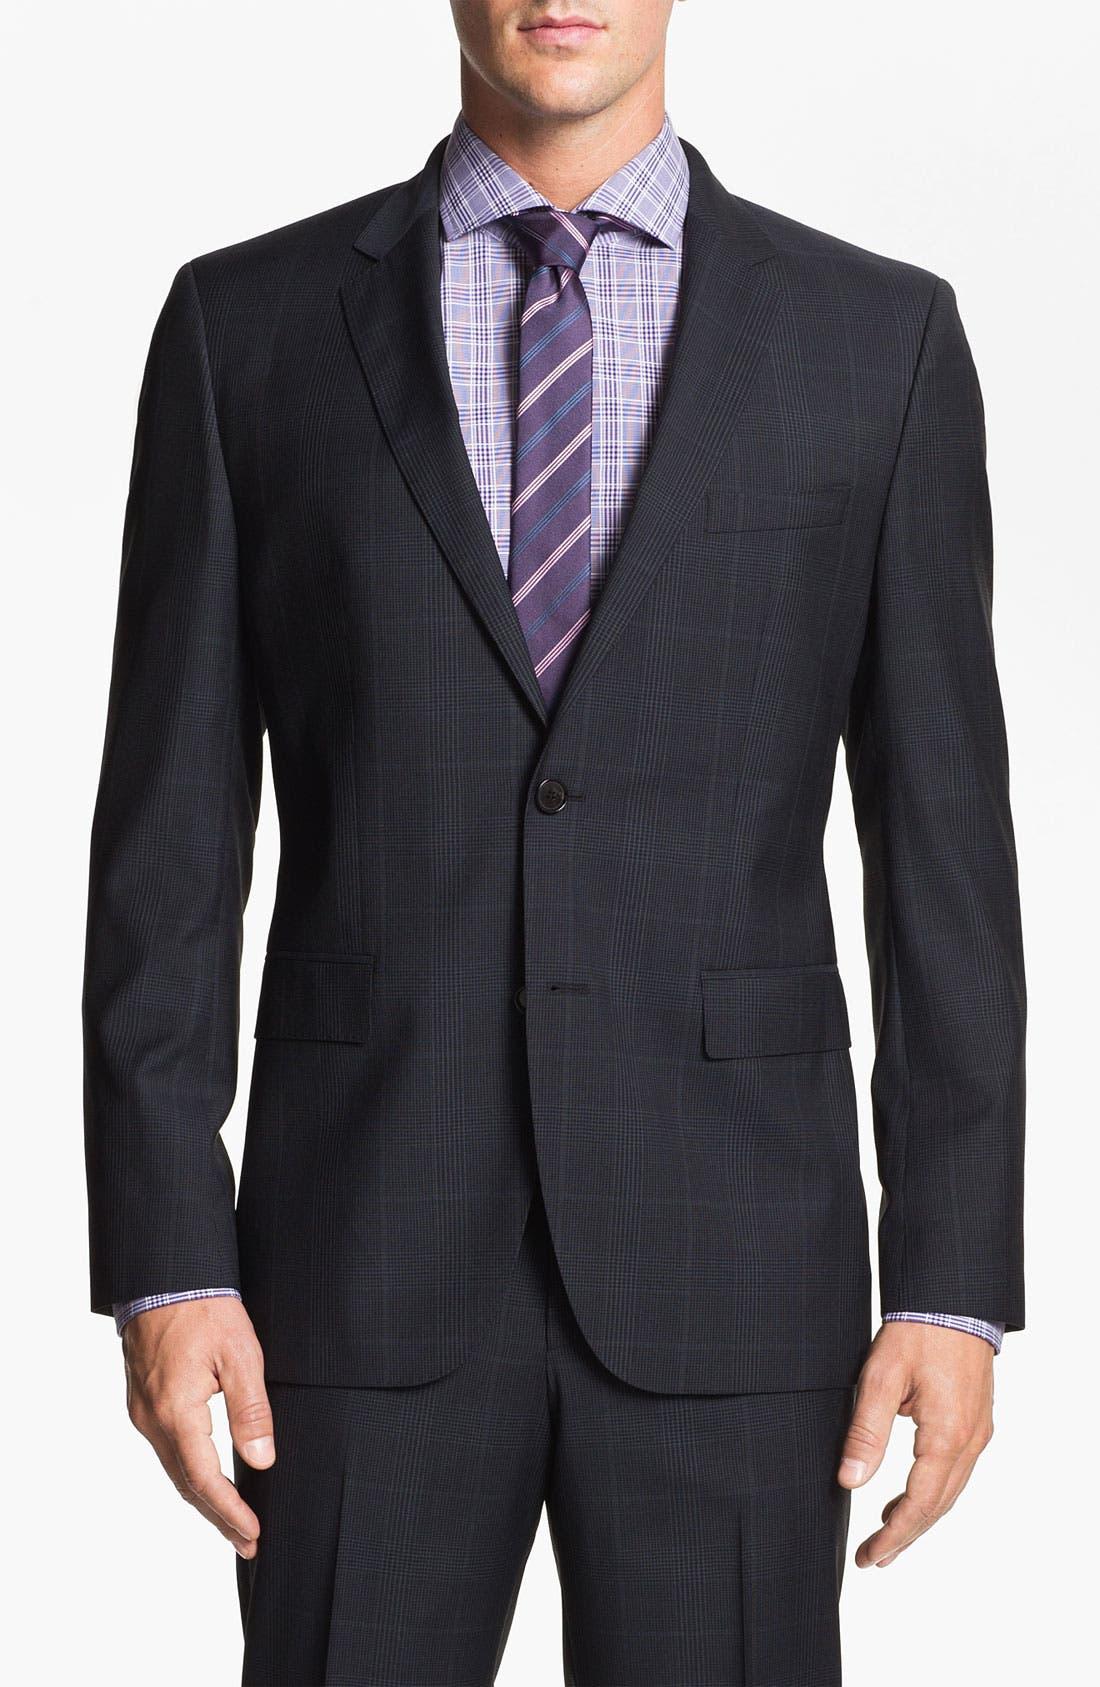 Alternate Image 1 Selected - BOSS Black 'Jam/Sharp' Trim Fit Plaid Suit